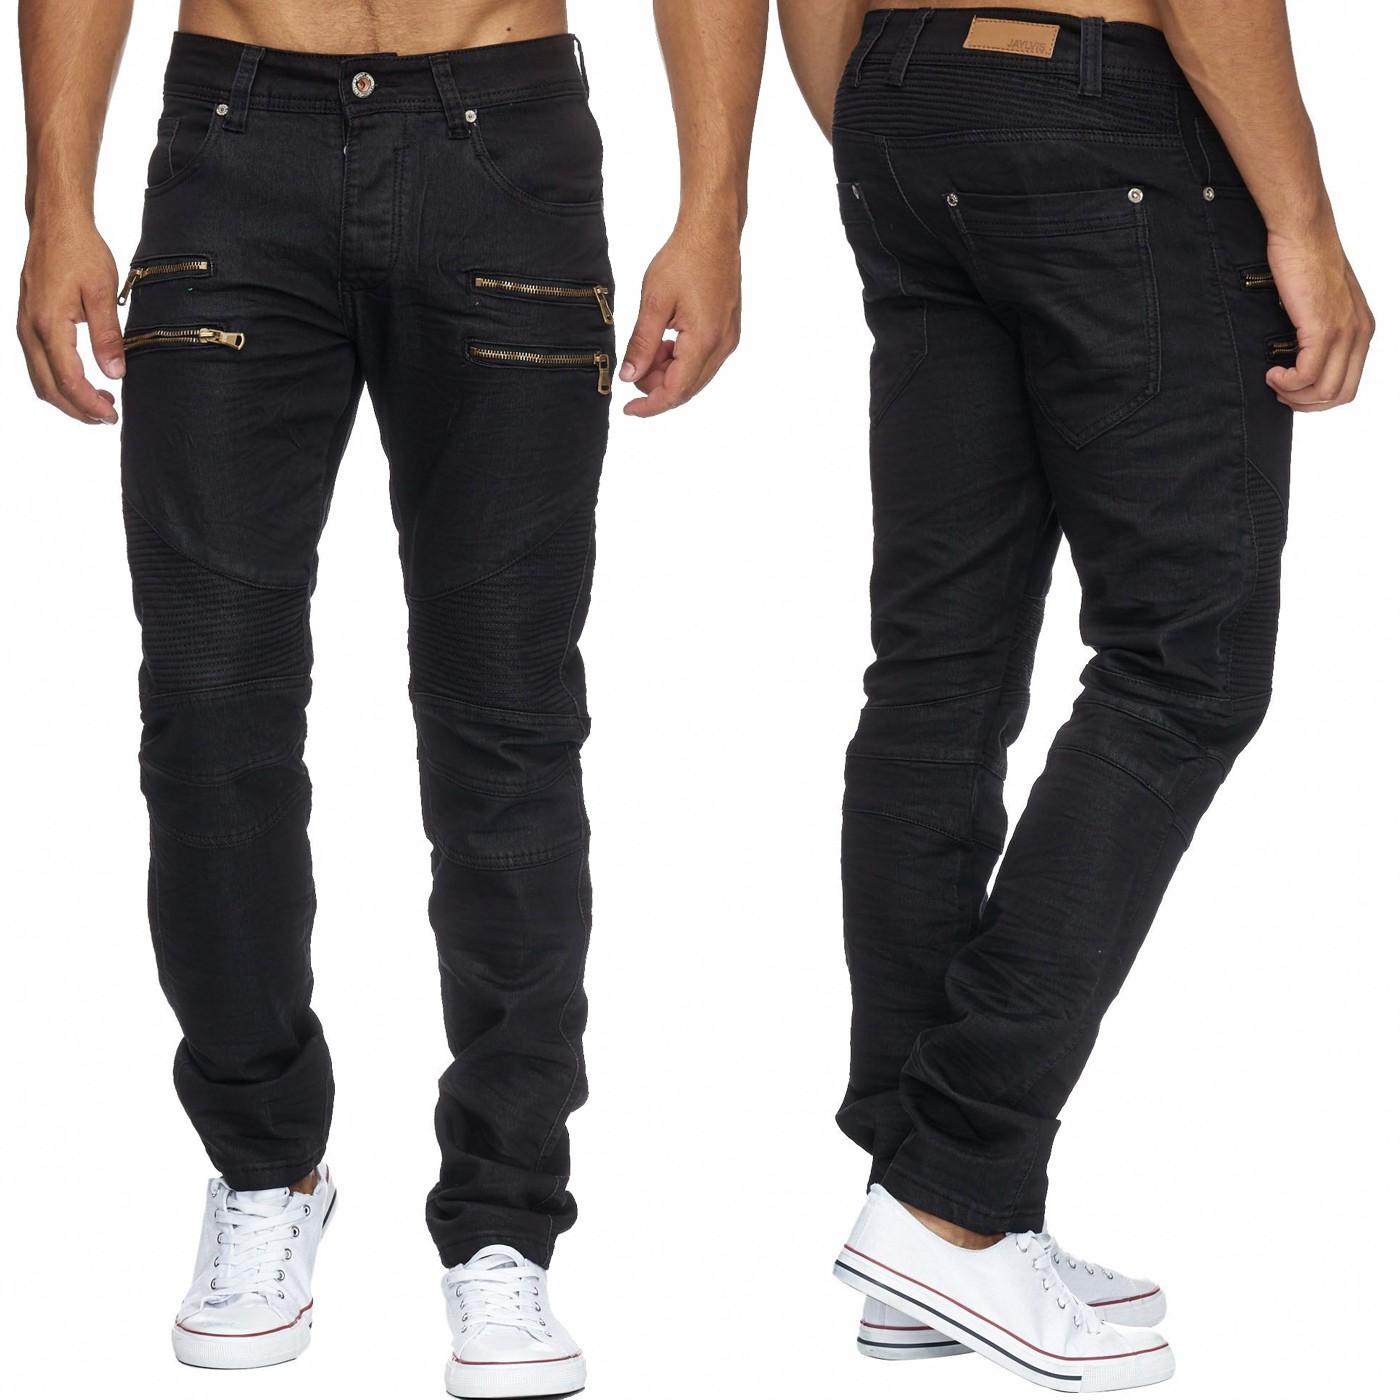 herren jeans hose gl nzend coated denim biker zipper used stoffhose schwarz neu ebay. Black Bedroom Furniture Sets. Home Design Ideas